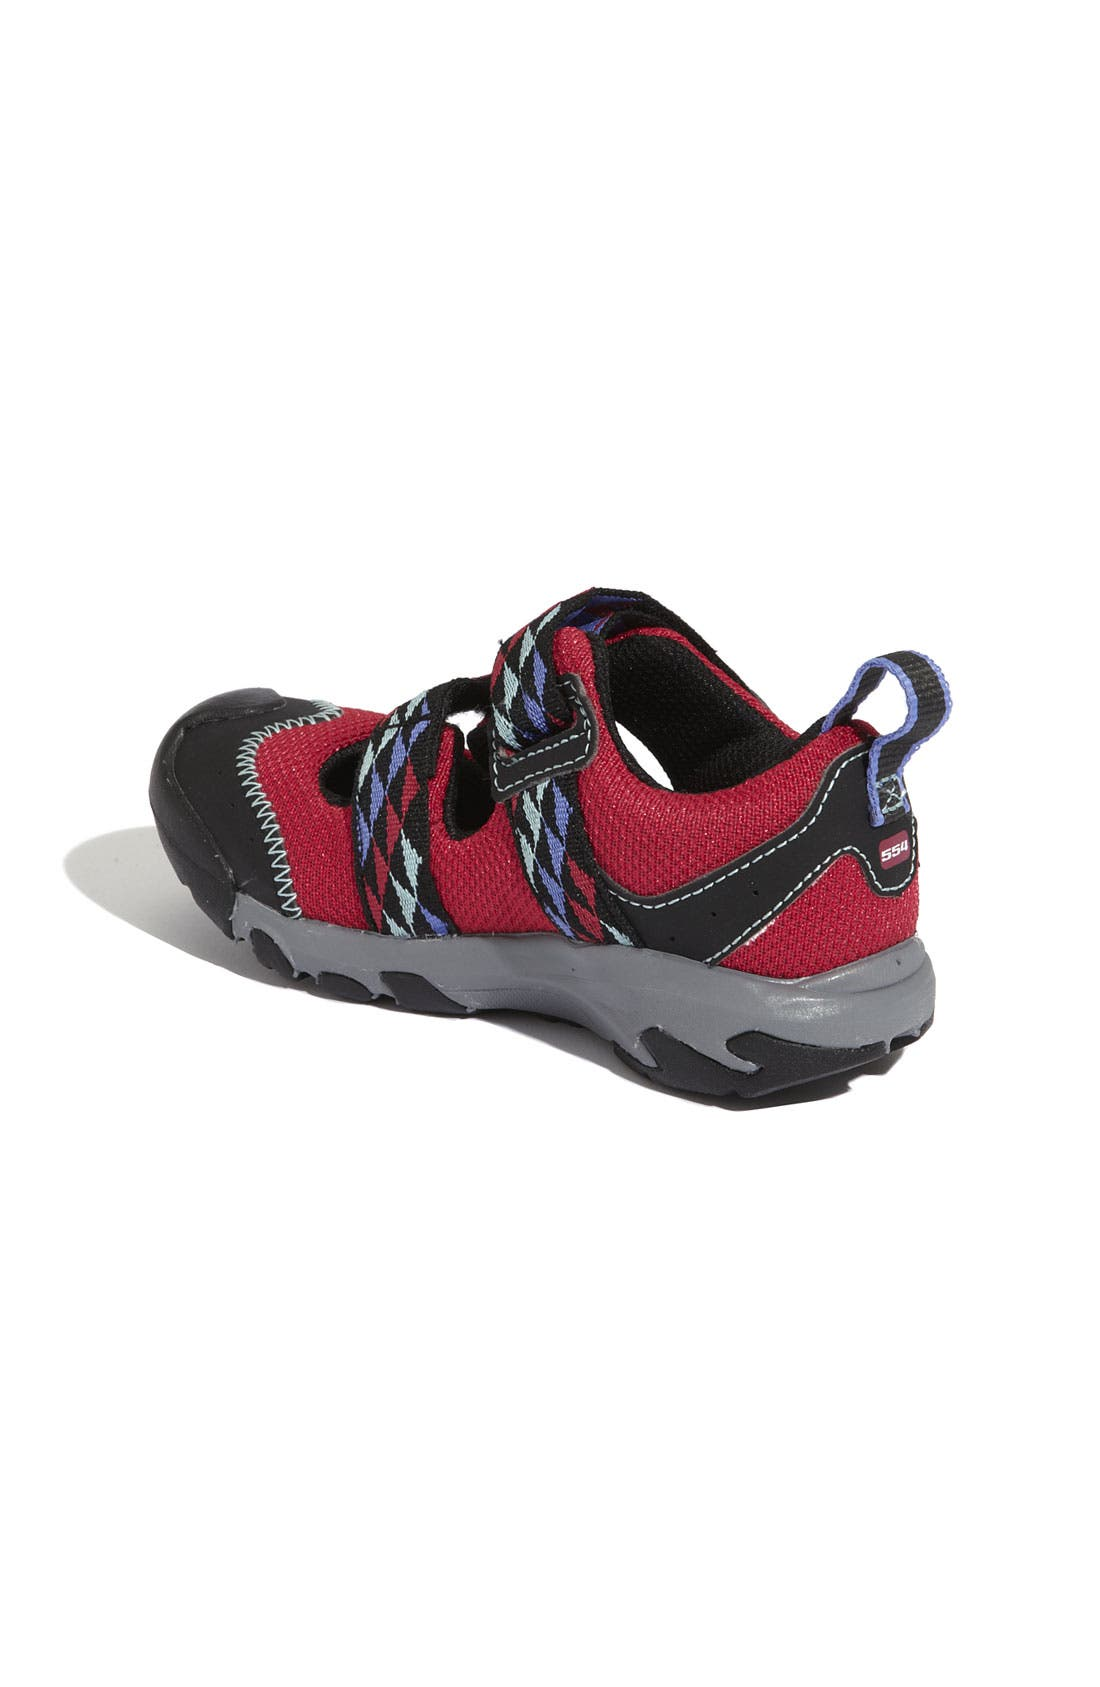 Alternate Image 2  - New Balance '554' Water Shoe (Walker, Toddler, Little Kid & Big Kid)